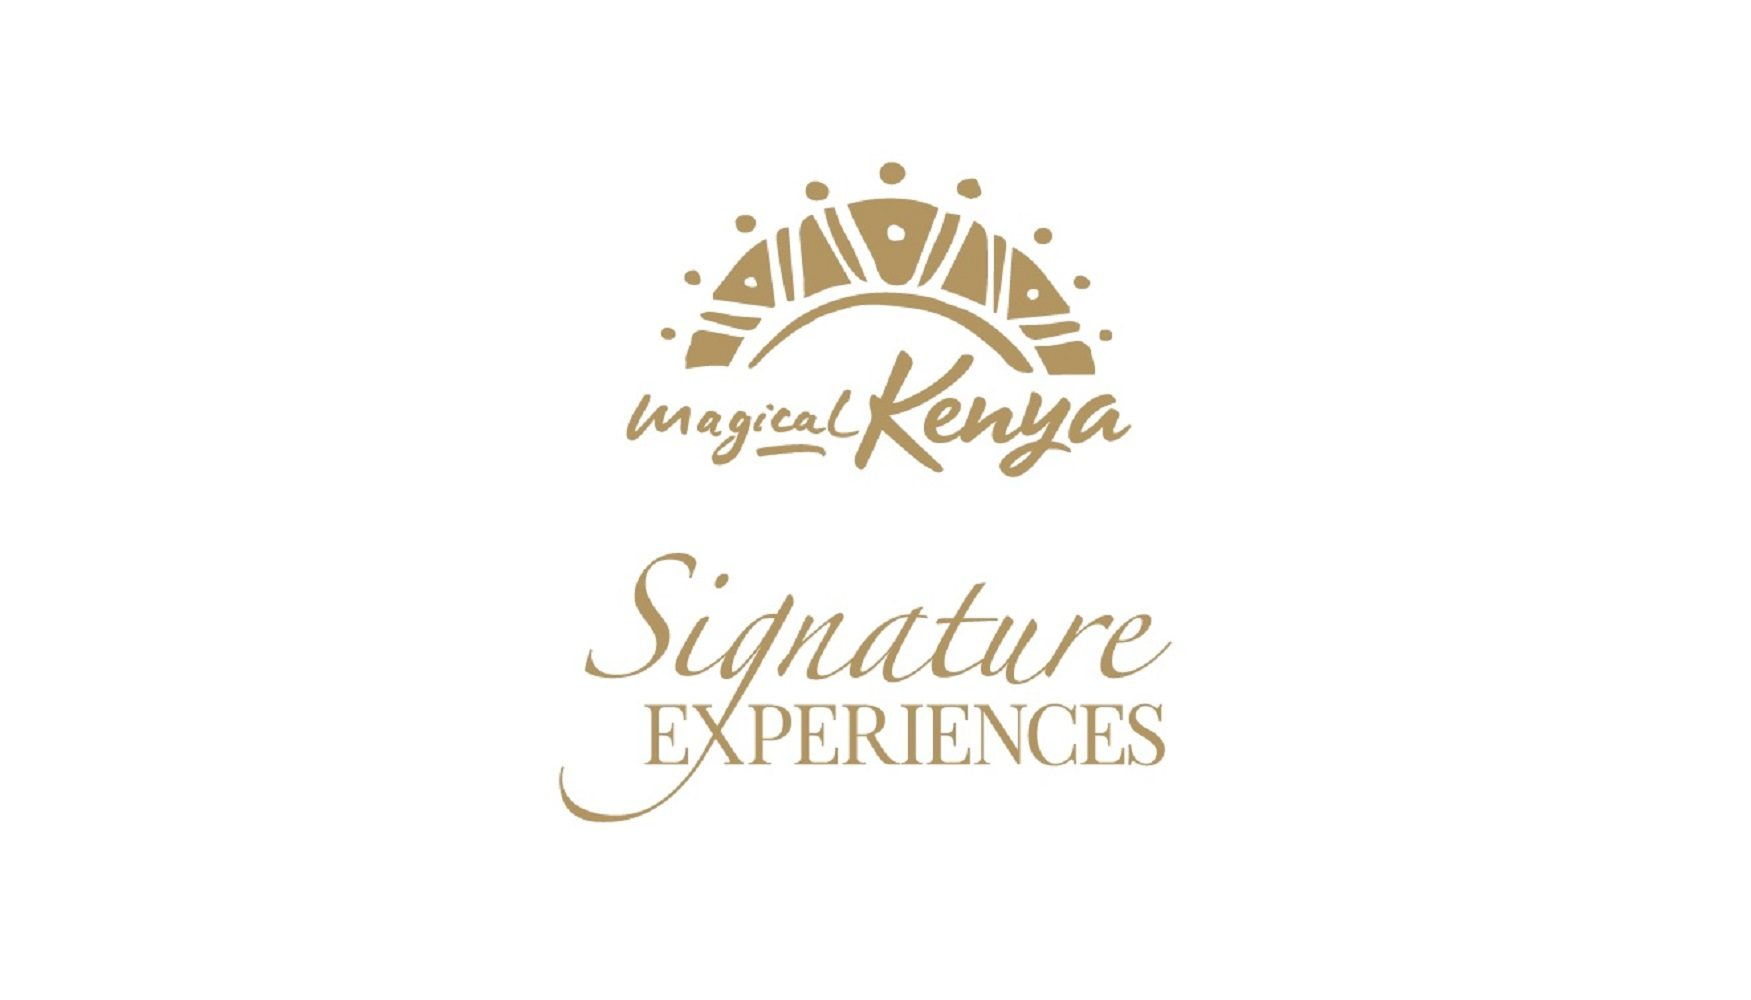 Magicalkenya Signature Experiences